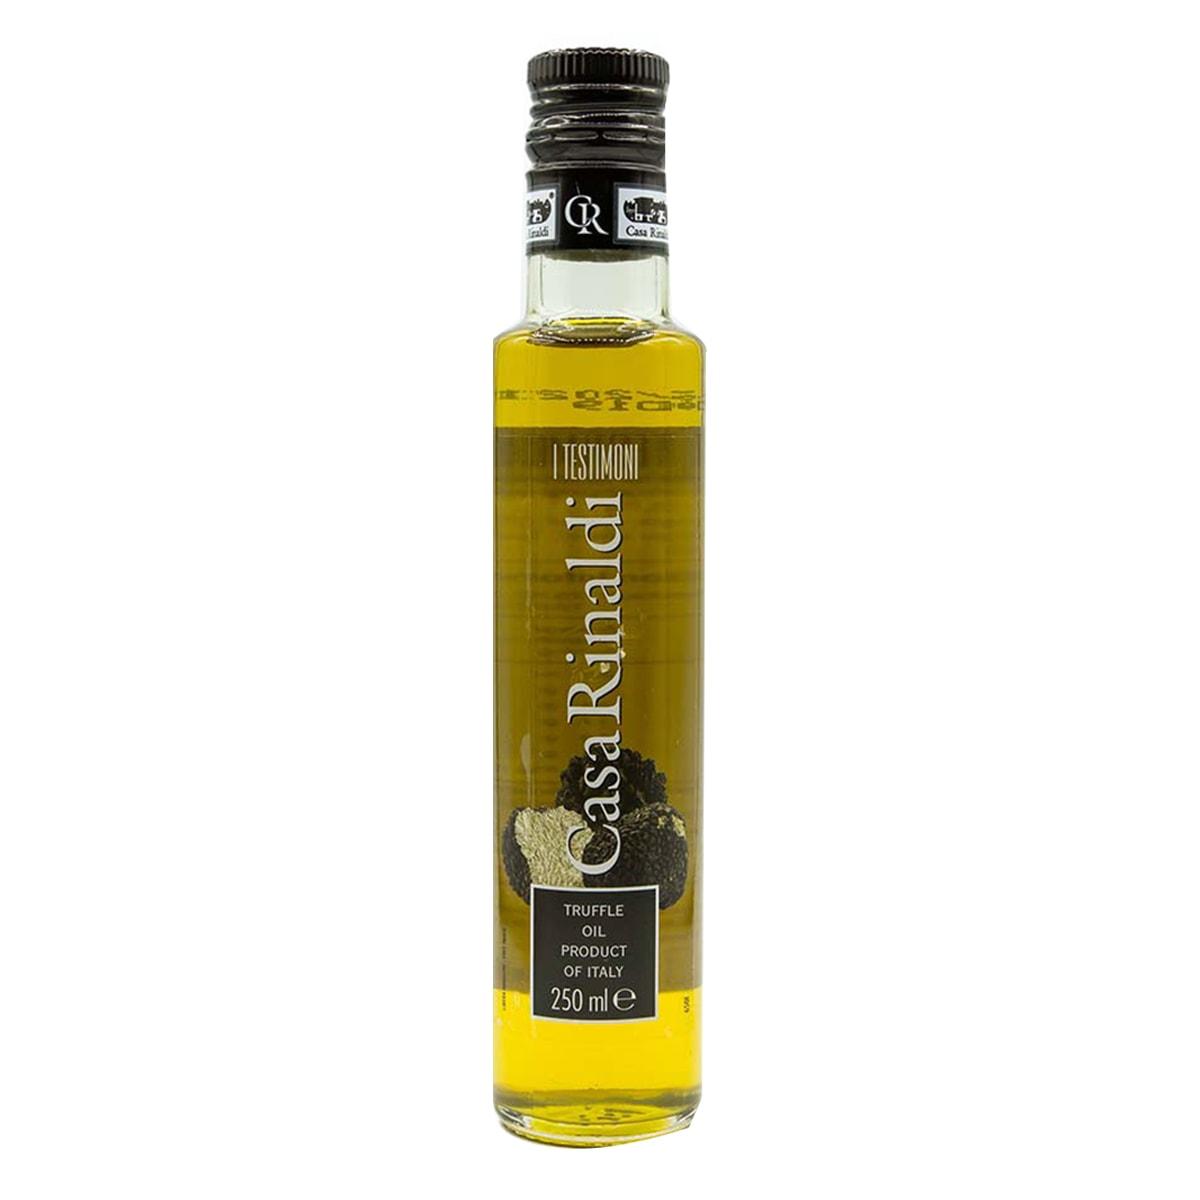 Buy Casa Rinaldi Truffle Oil Product of Italy - 250 ml